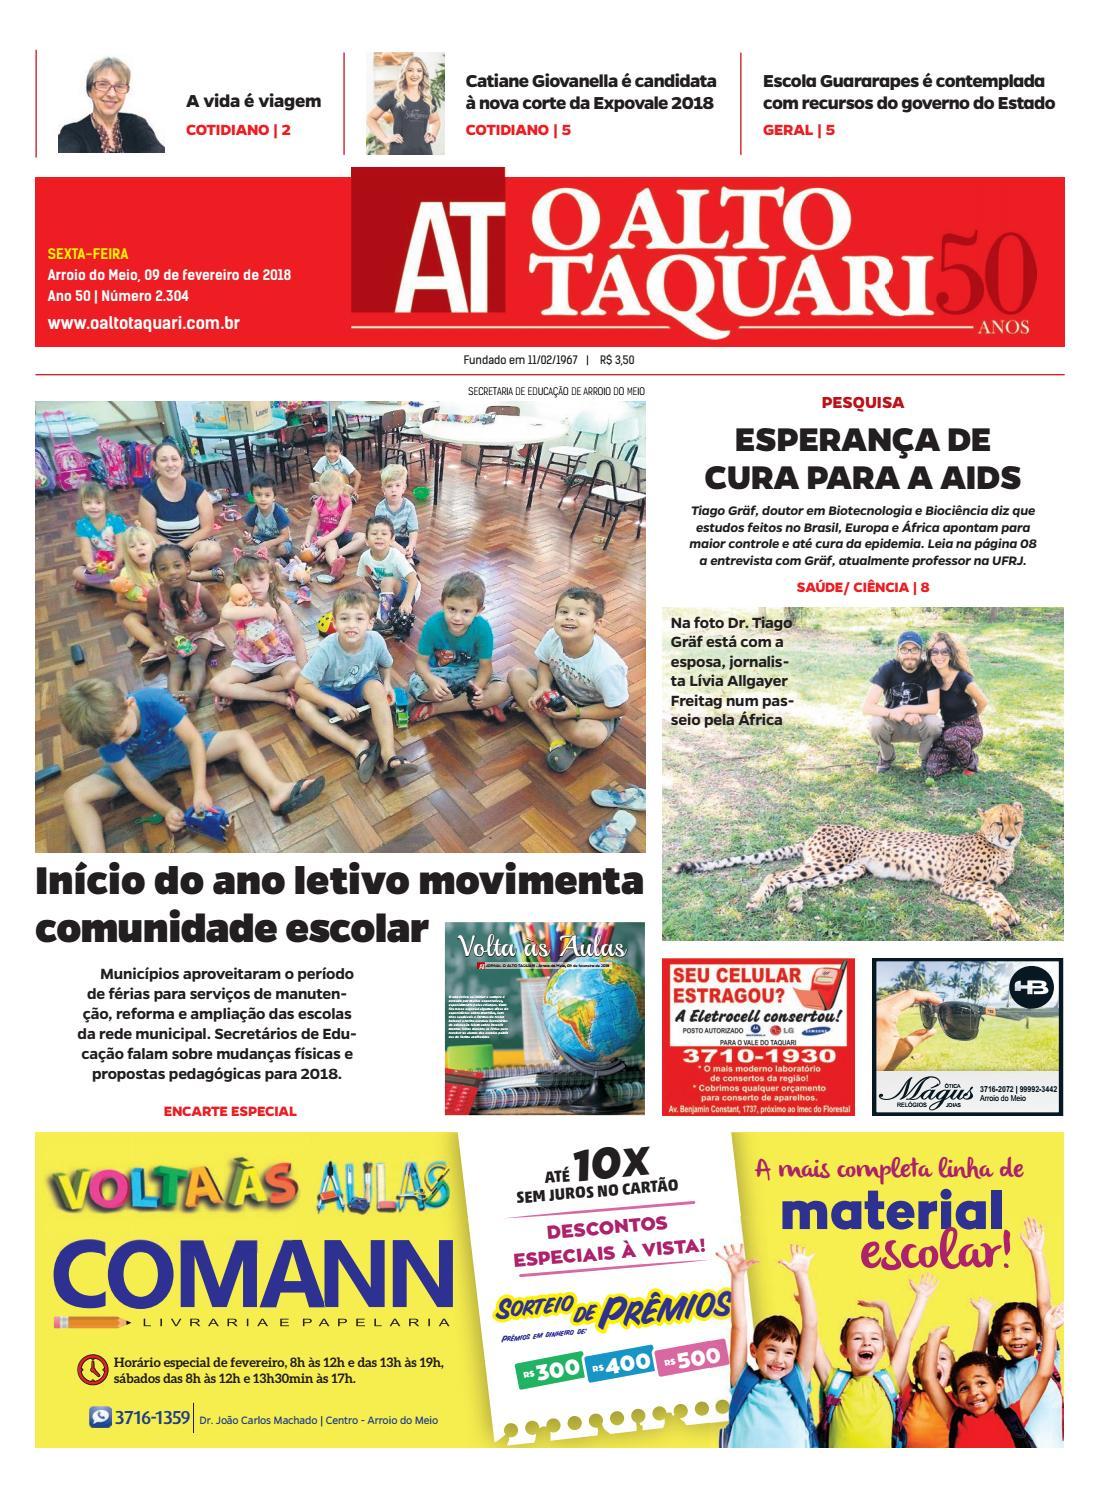 257a509bd Jornal O Alto Taquari - 09 de fevereiro de 2018 by Jornal O Alto Taquari -  issuu